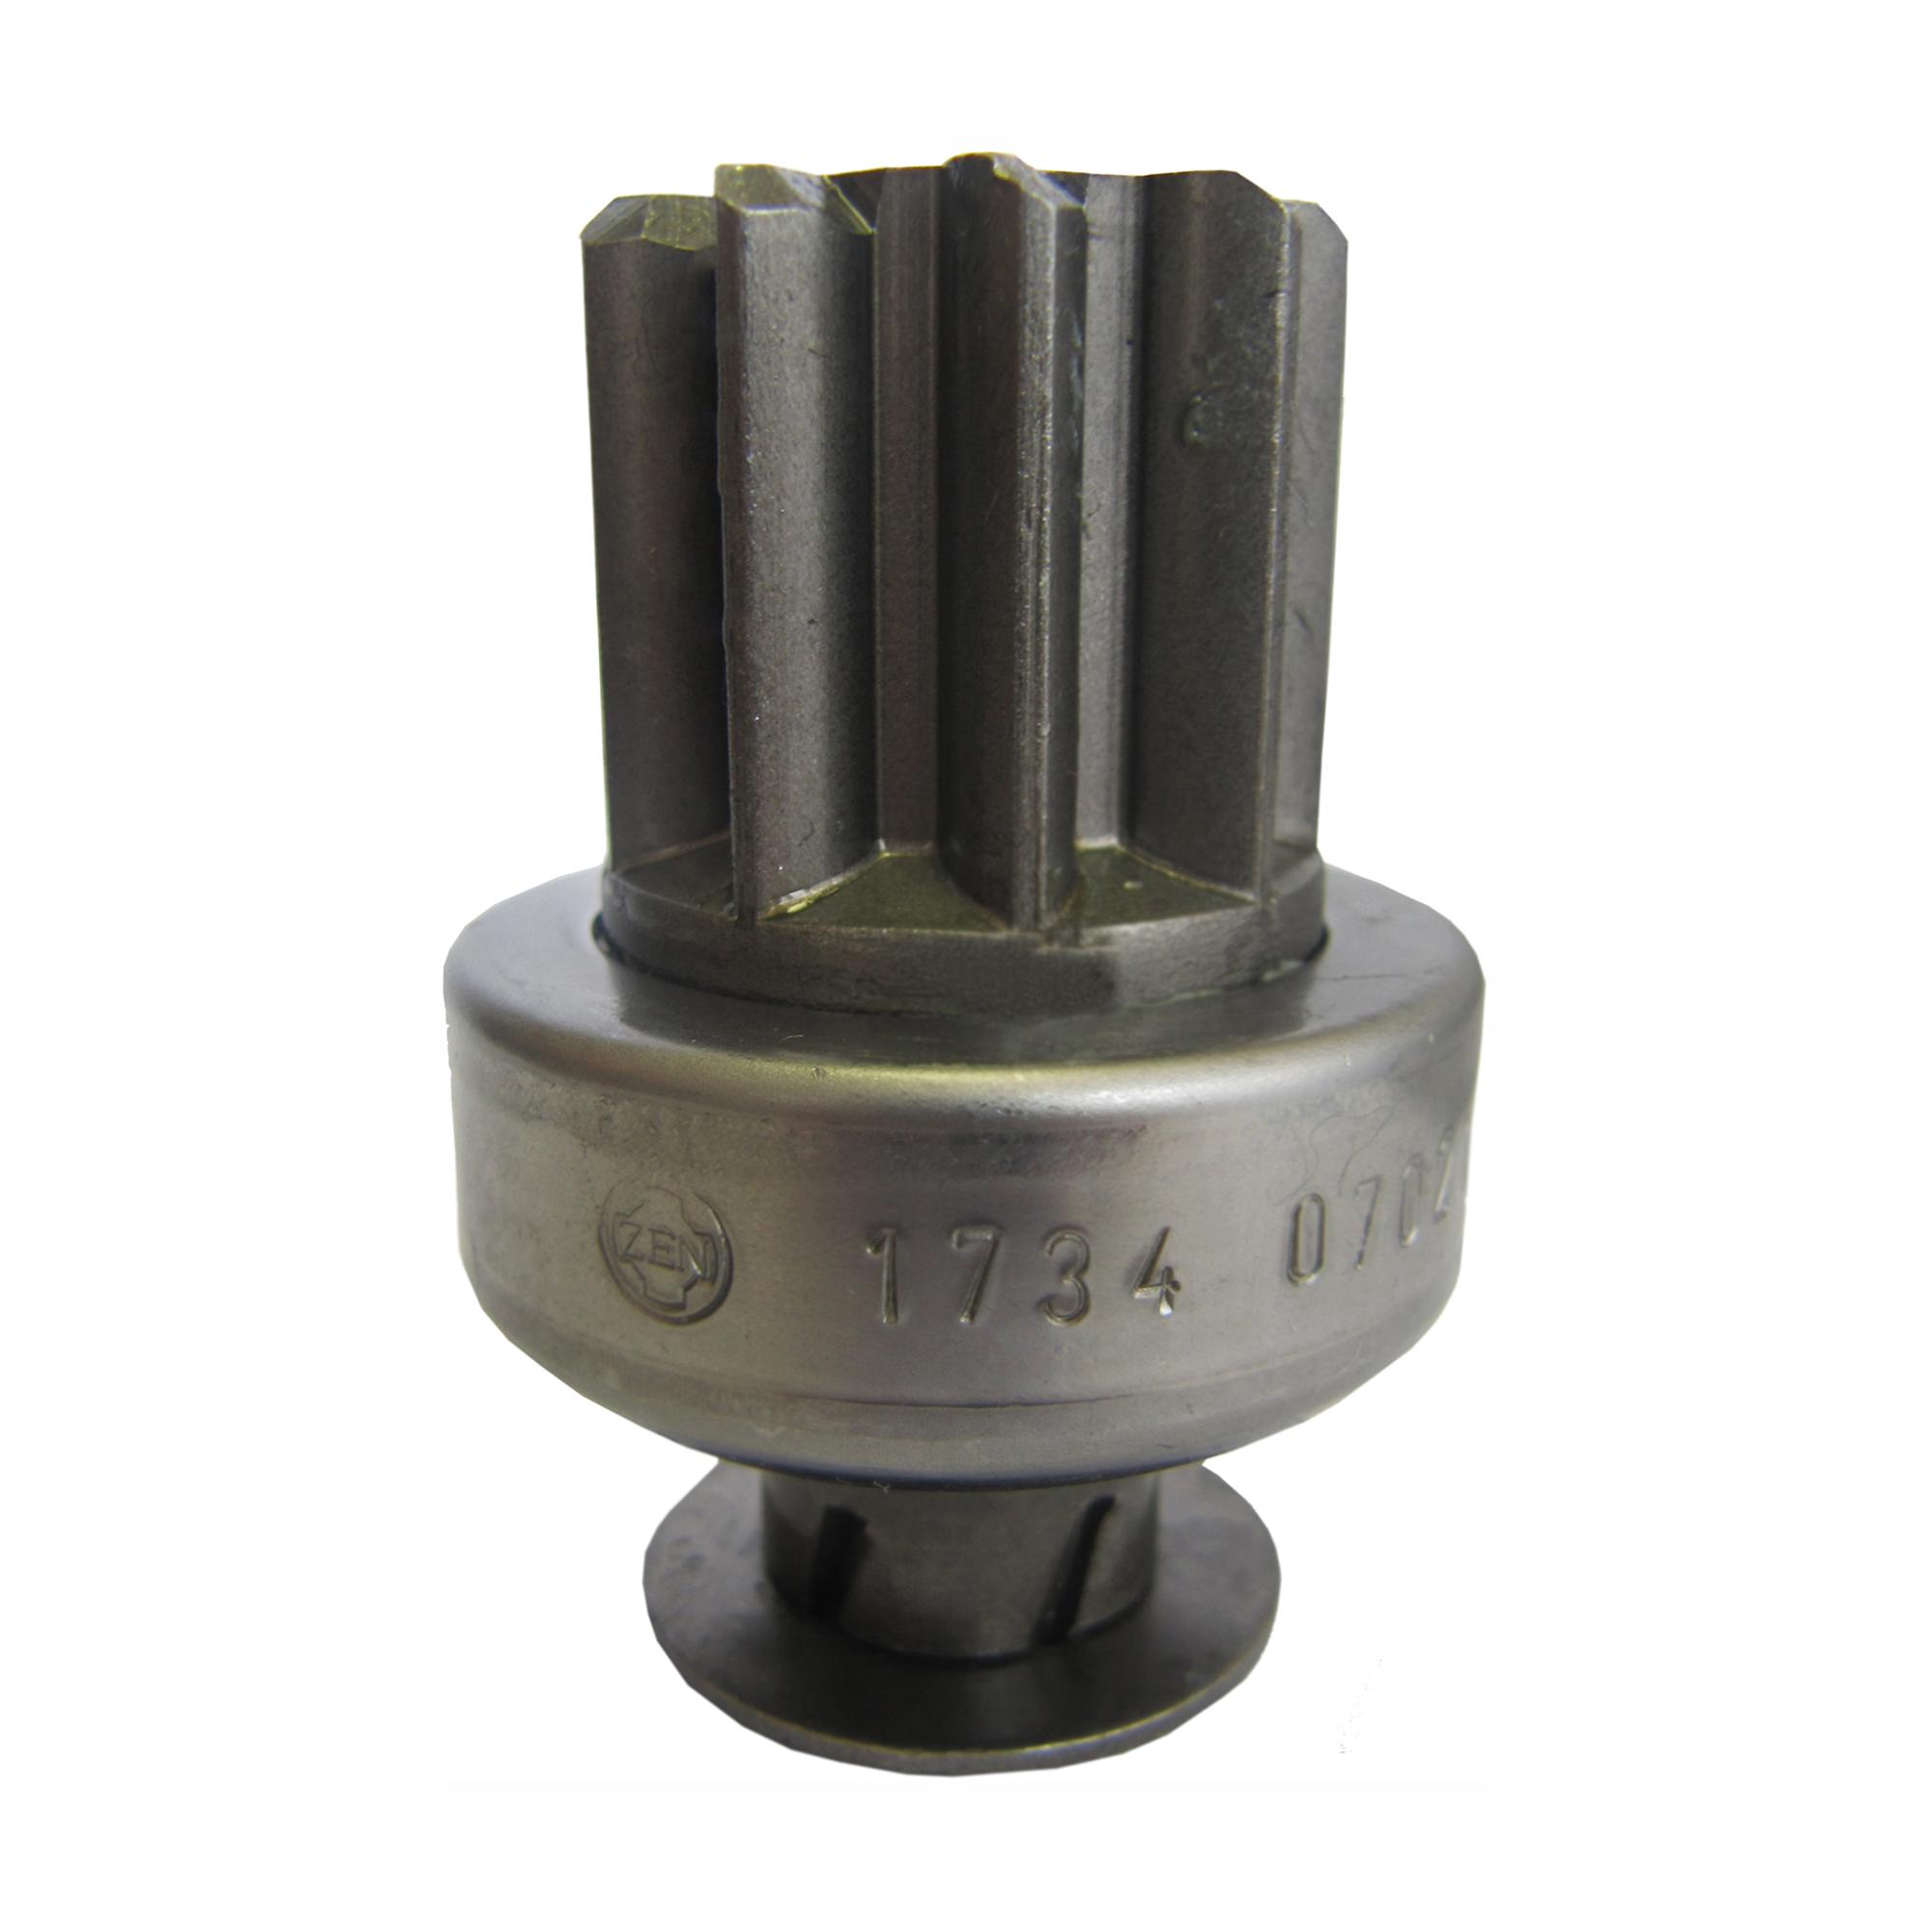 Bendix Motor de Partida CIVIC CRV - 9 Dentes (ZEN1734) - ZEN